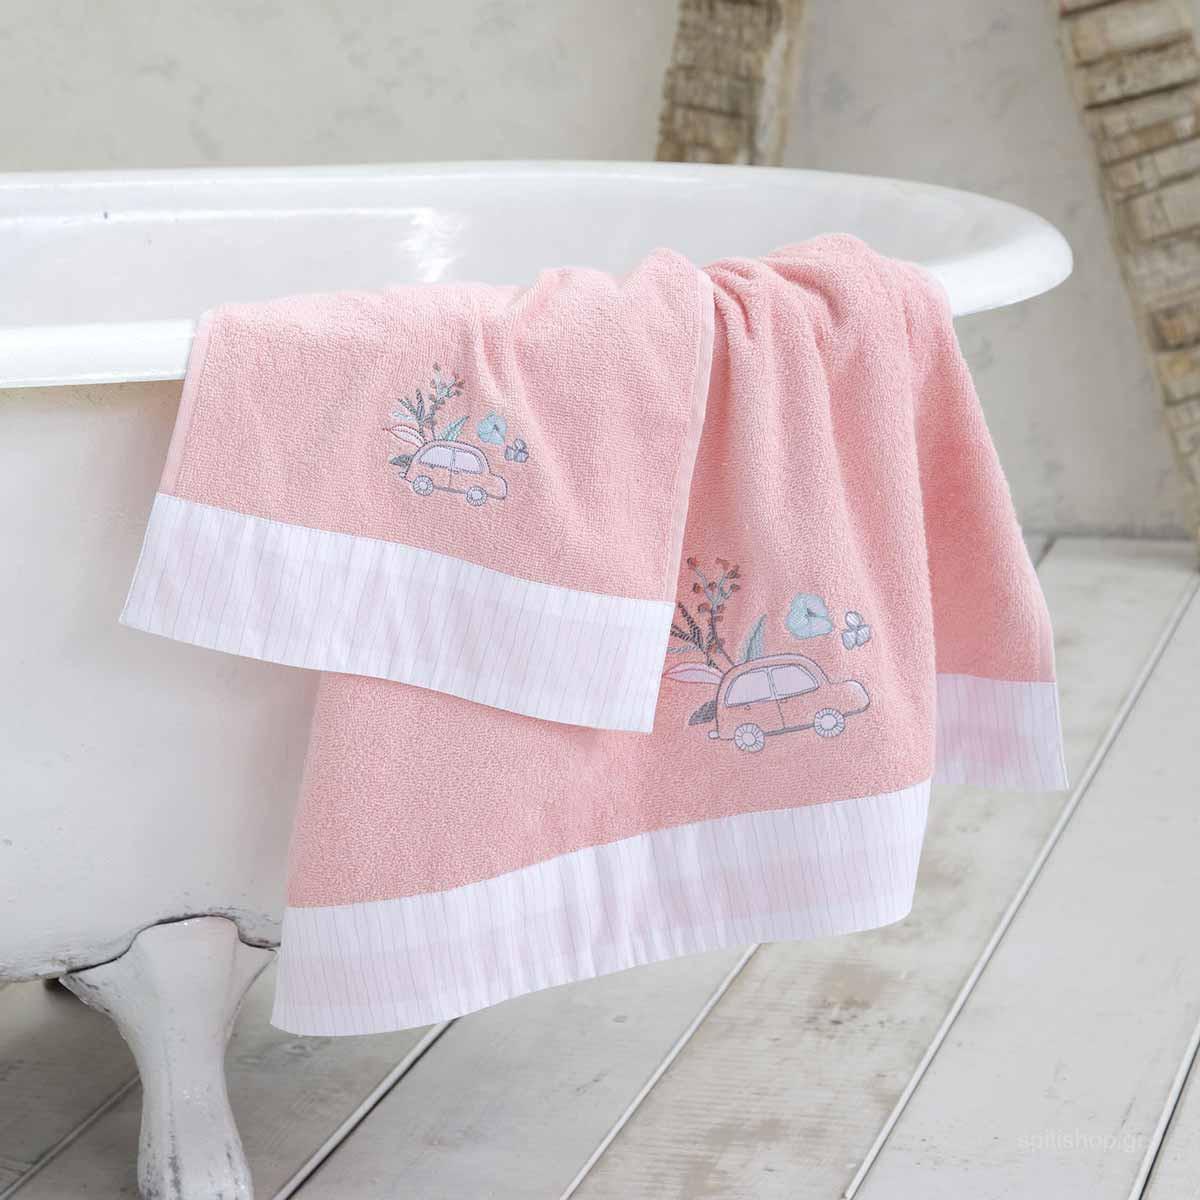 6b4cc1f6c72 -10% Spiti Shop Παιδικές Πετσέτες (Σετ 3τμχ) Nima Kids Nora